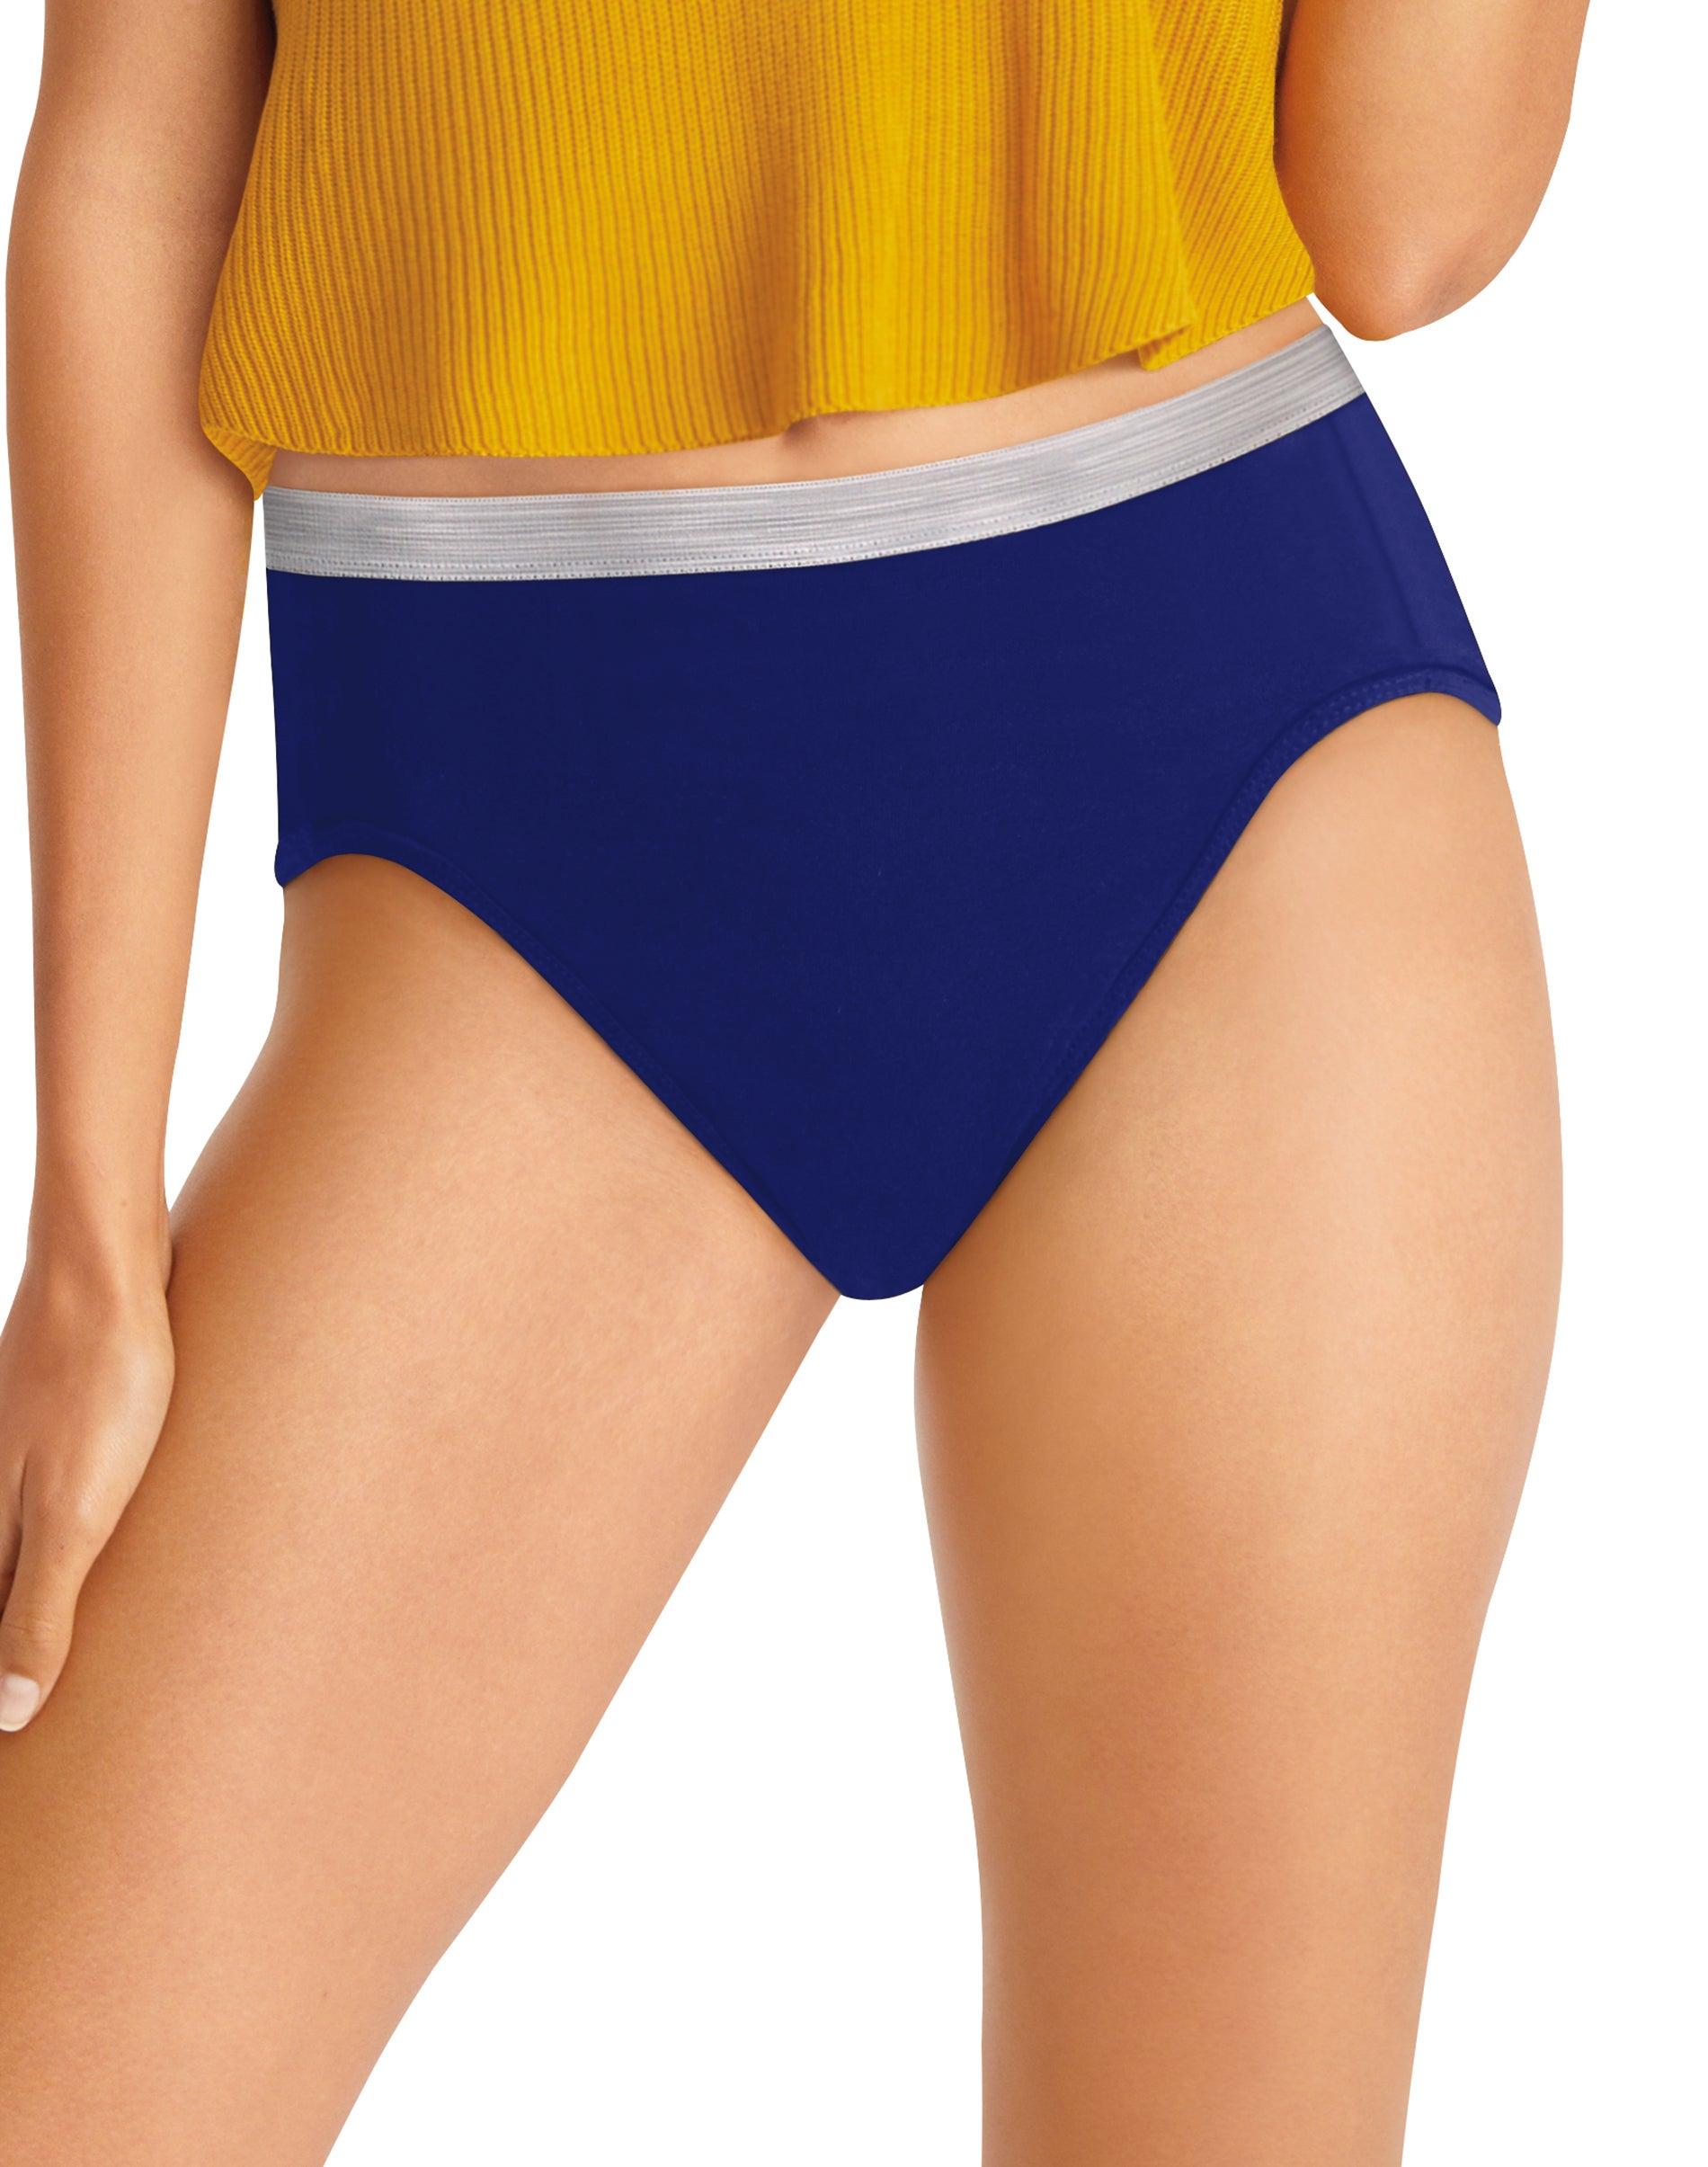 Hanes Womens Hi-Cuts 100/% Cotton Panties 10 Pack Size 8 Various Colors Tagless